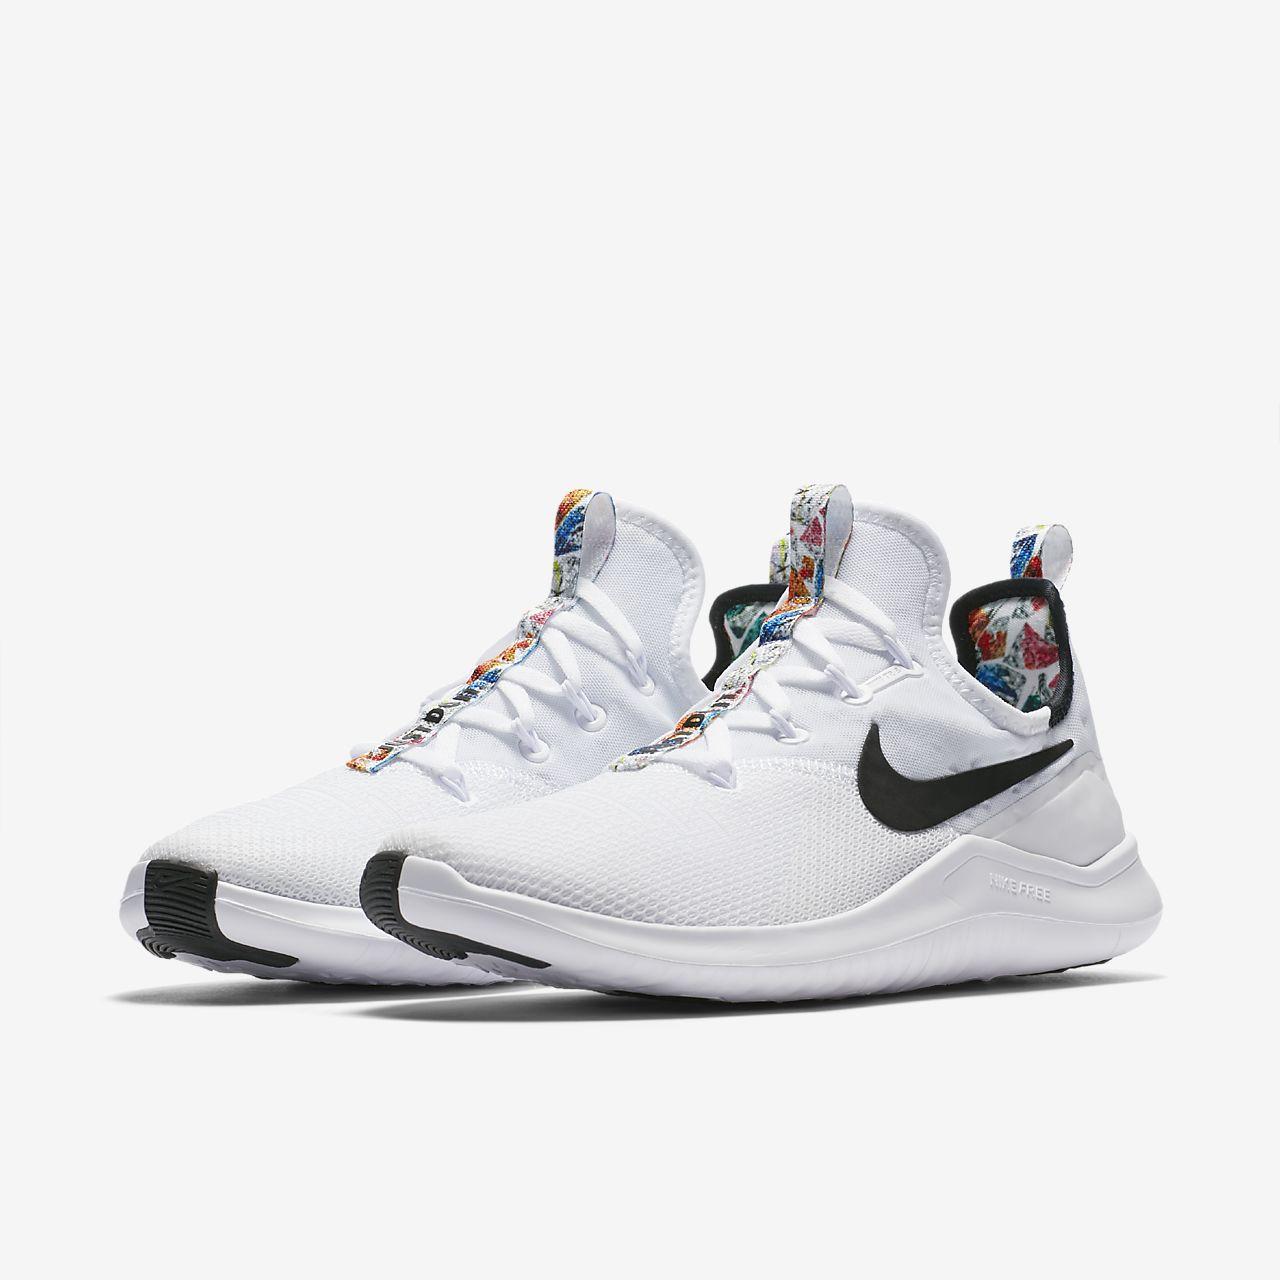 Nike Free TR8 Damen-Trainingsschuh - Weiß HmVlgTMzU